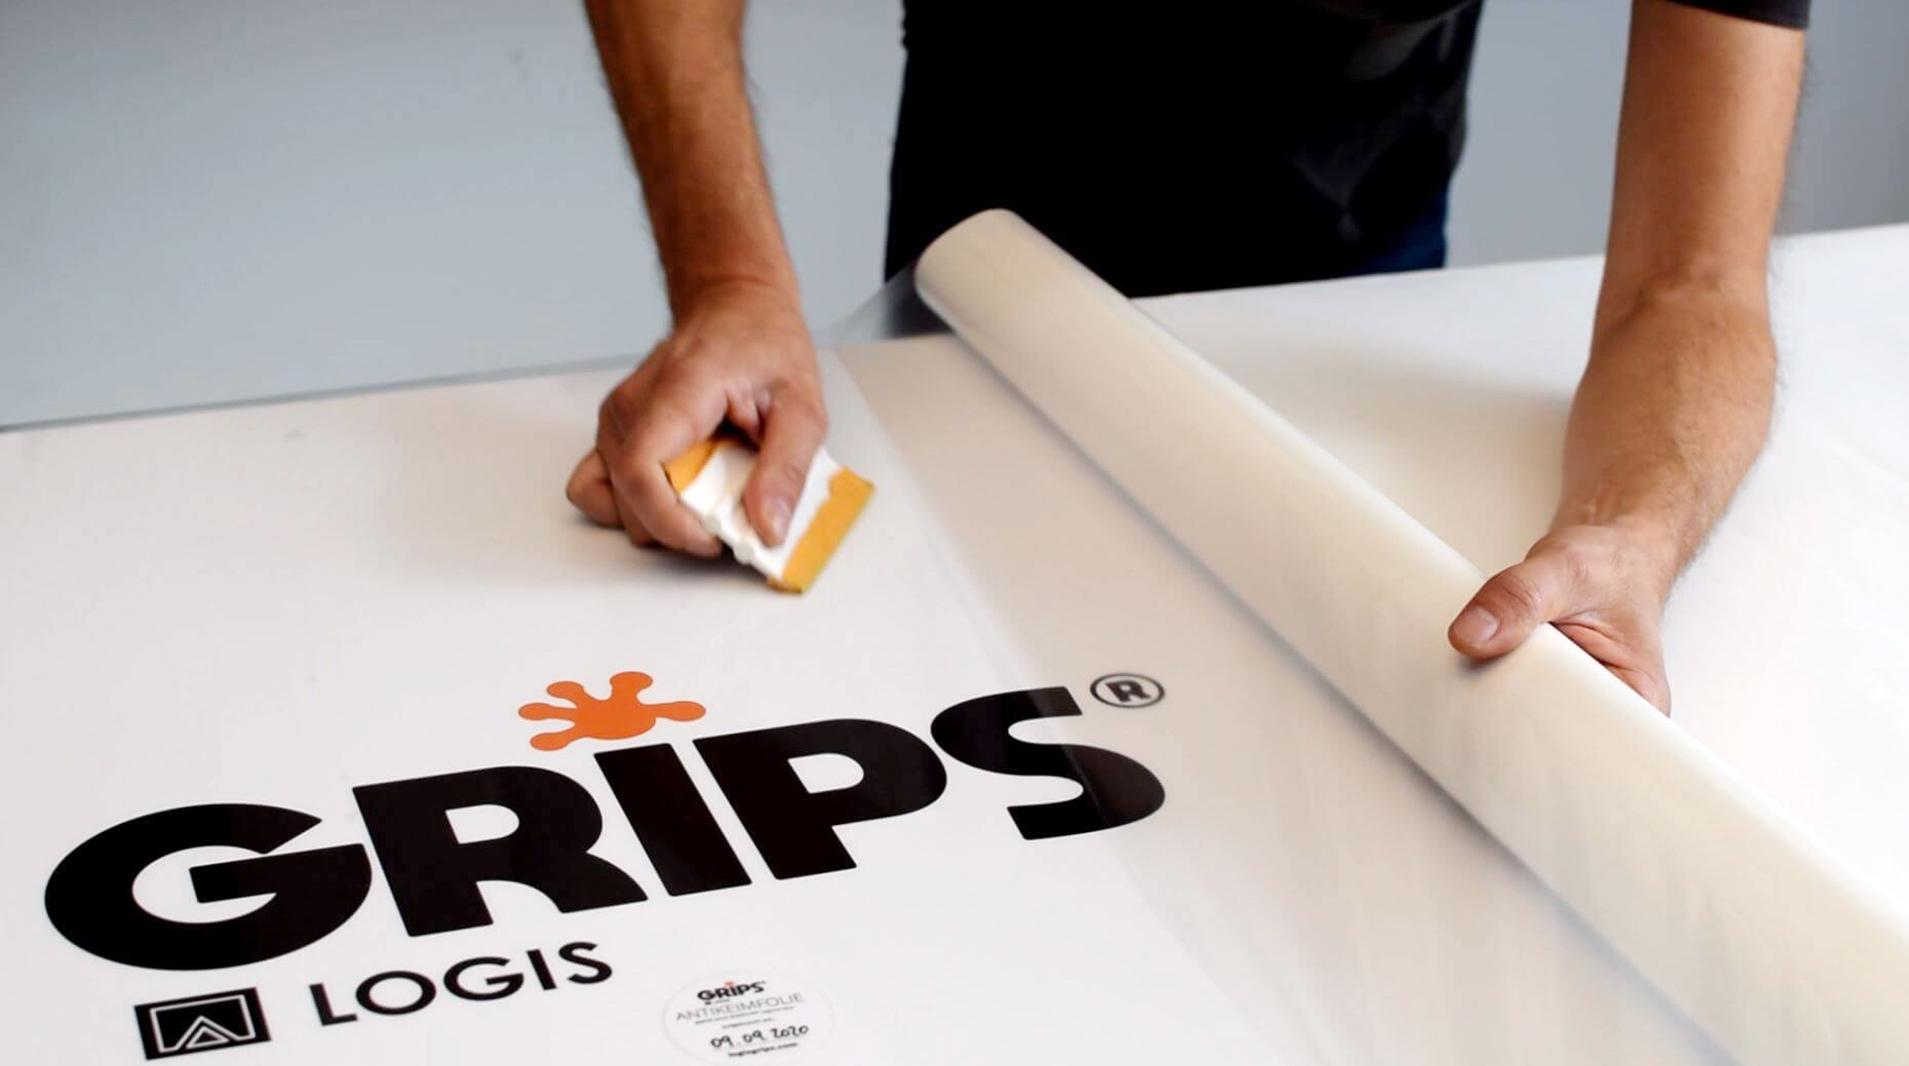 LOGIS GRIPS® – Antikeimfolie Rolle 10m x 1,37m